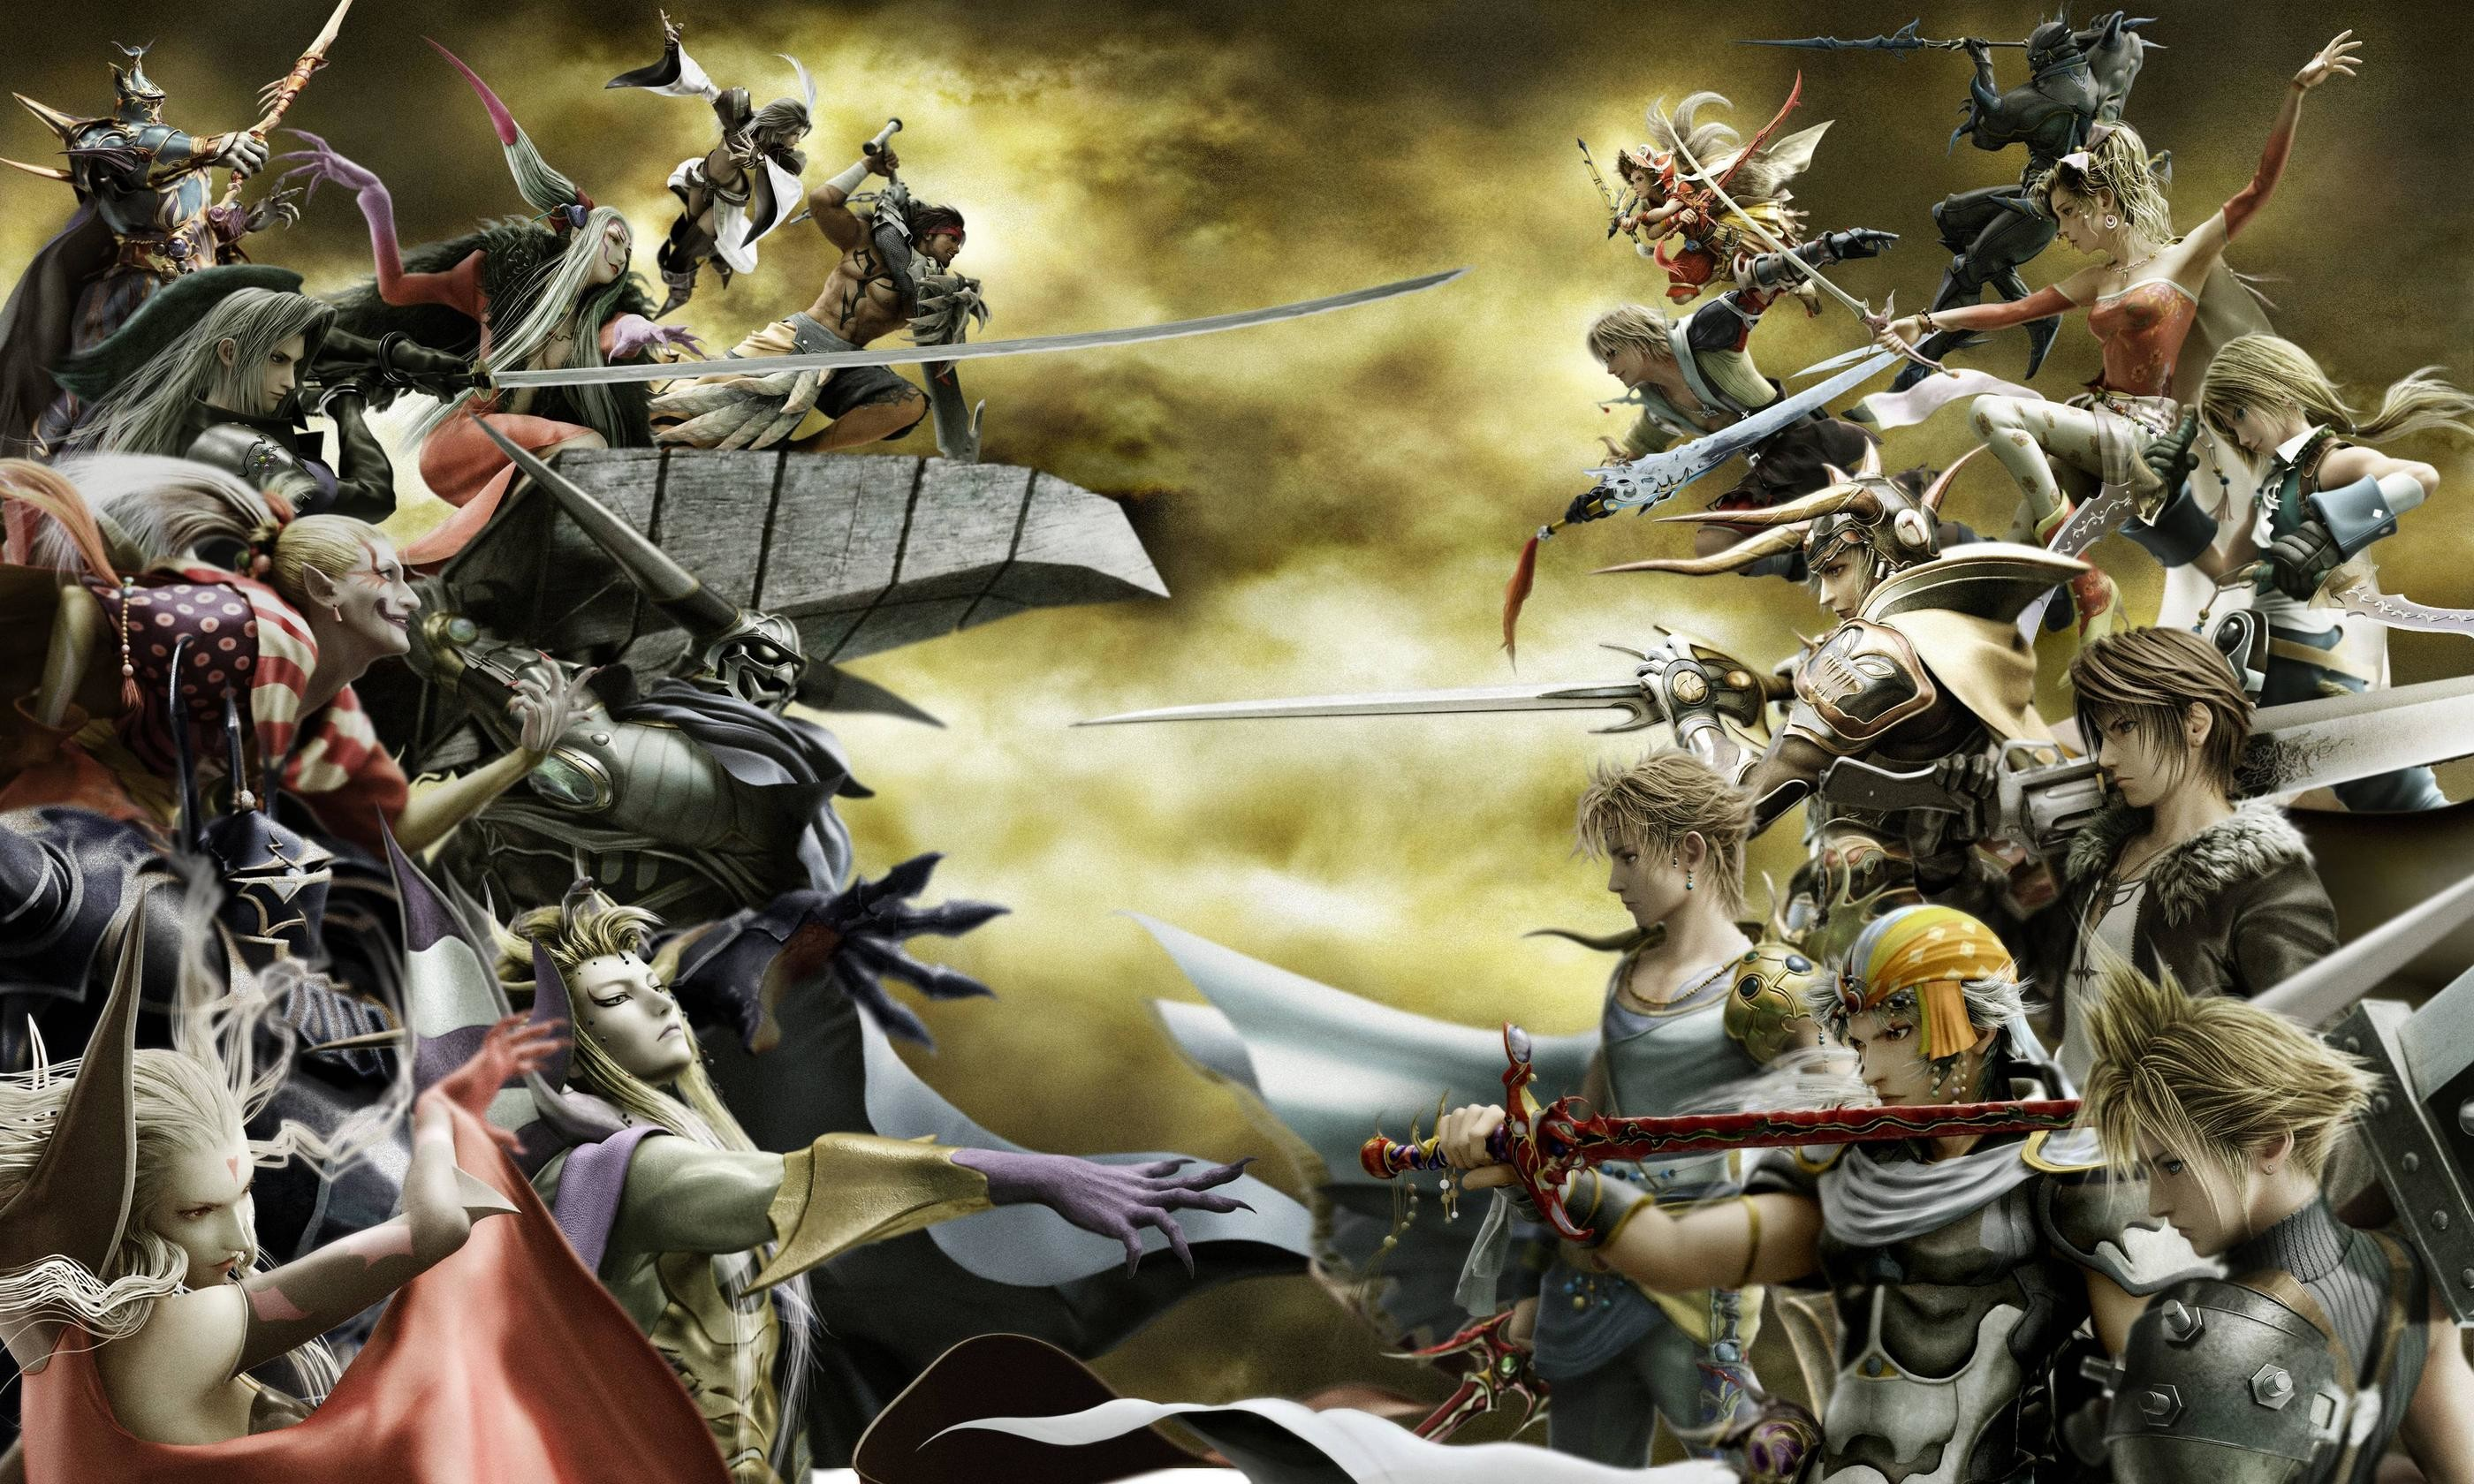 Dissidia Final Fantasy Wallpapers – The Final Fantasy Wiki has .